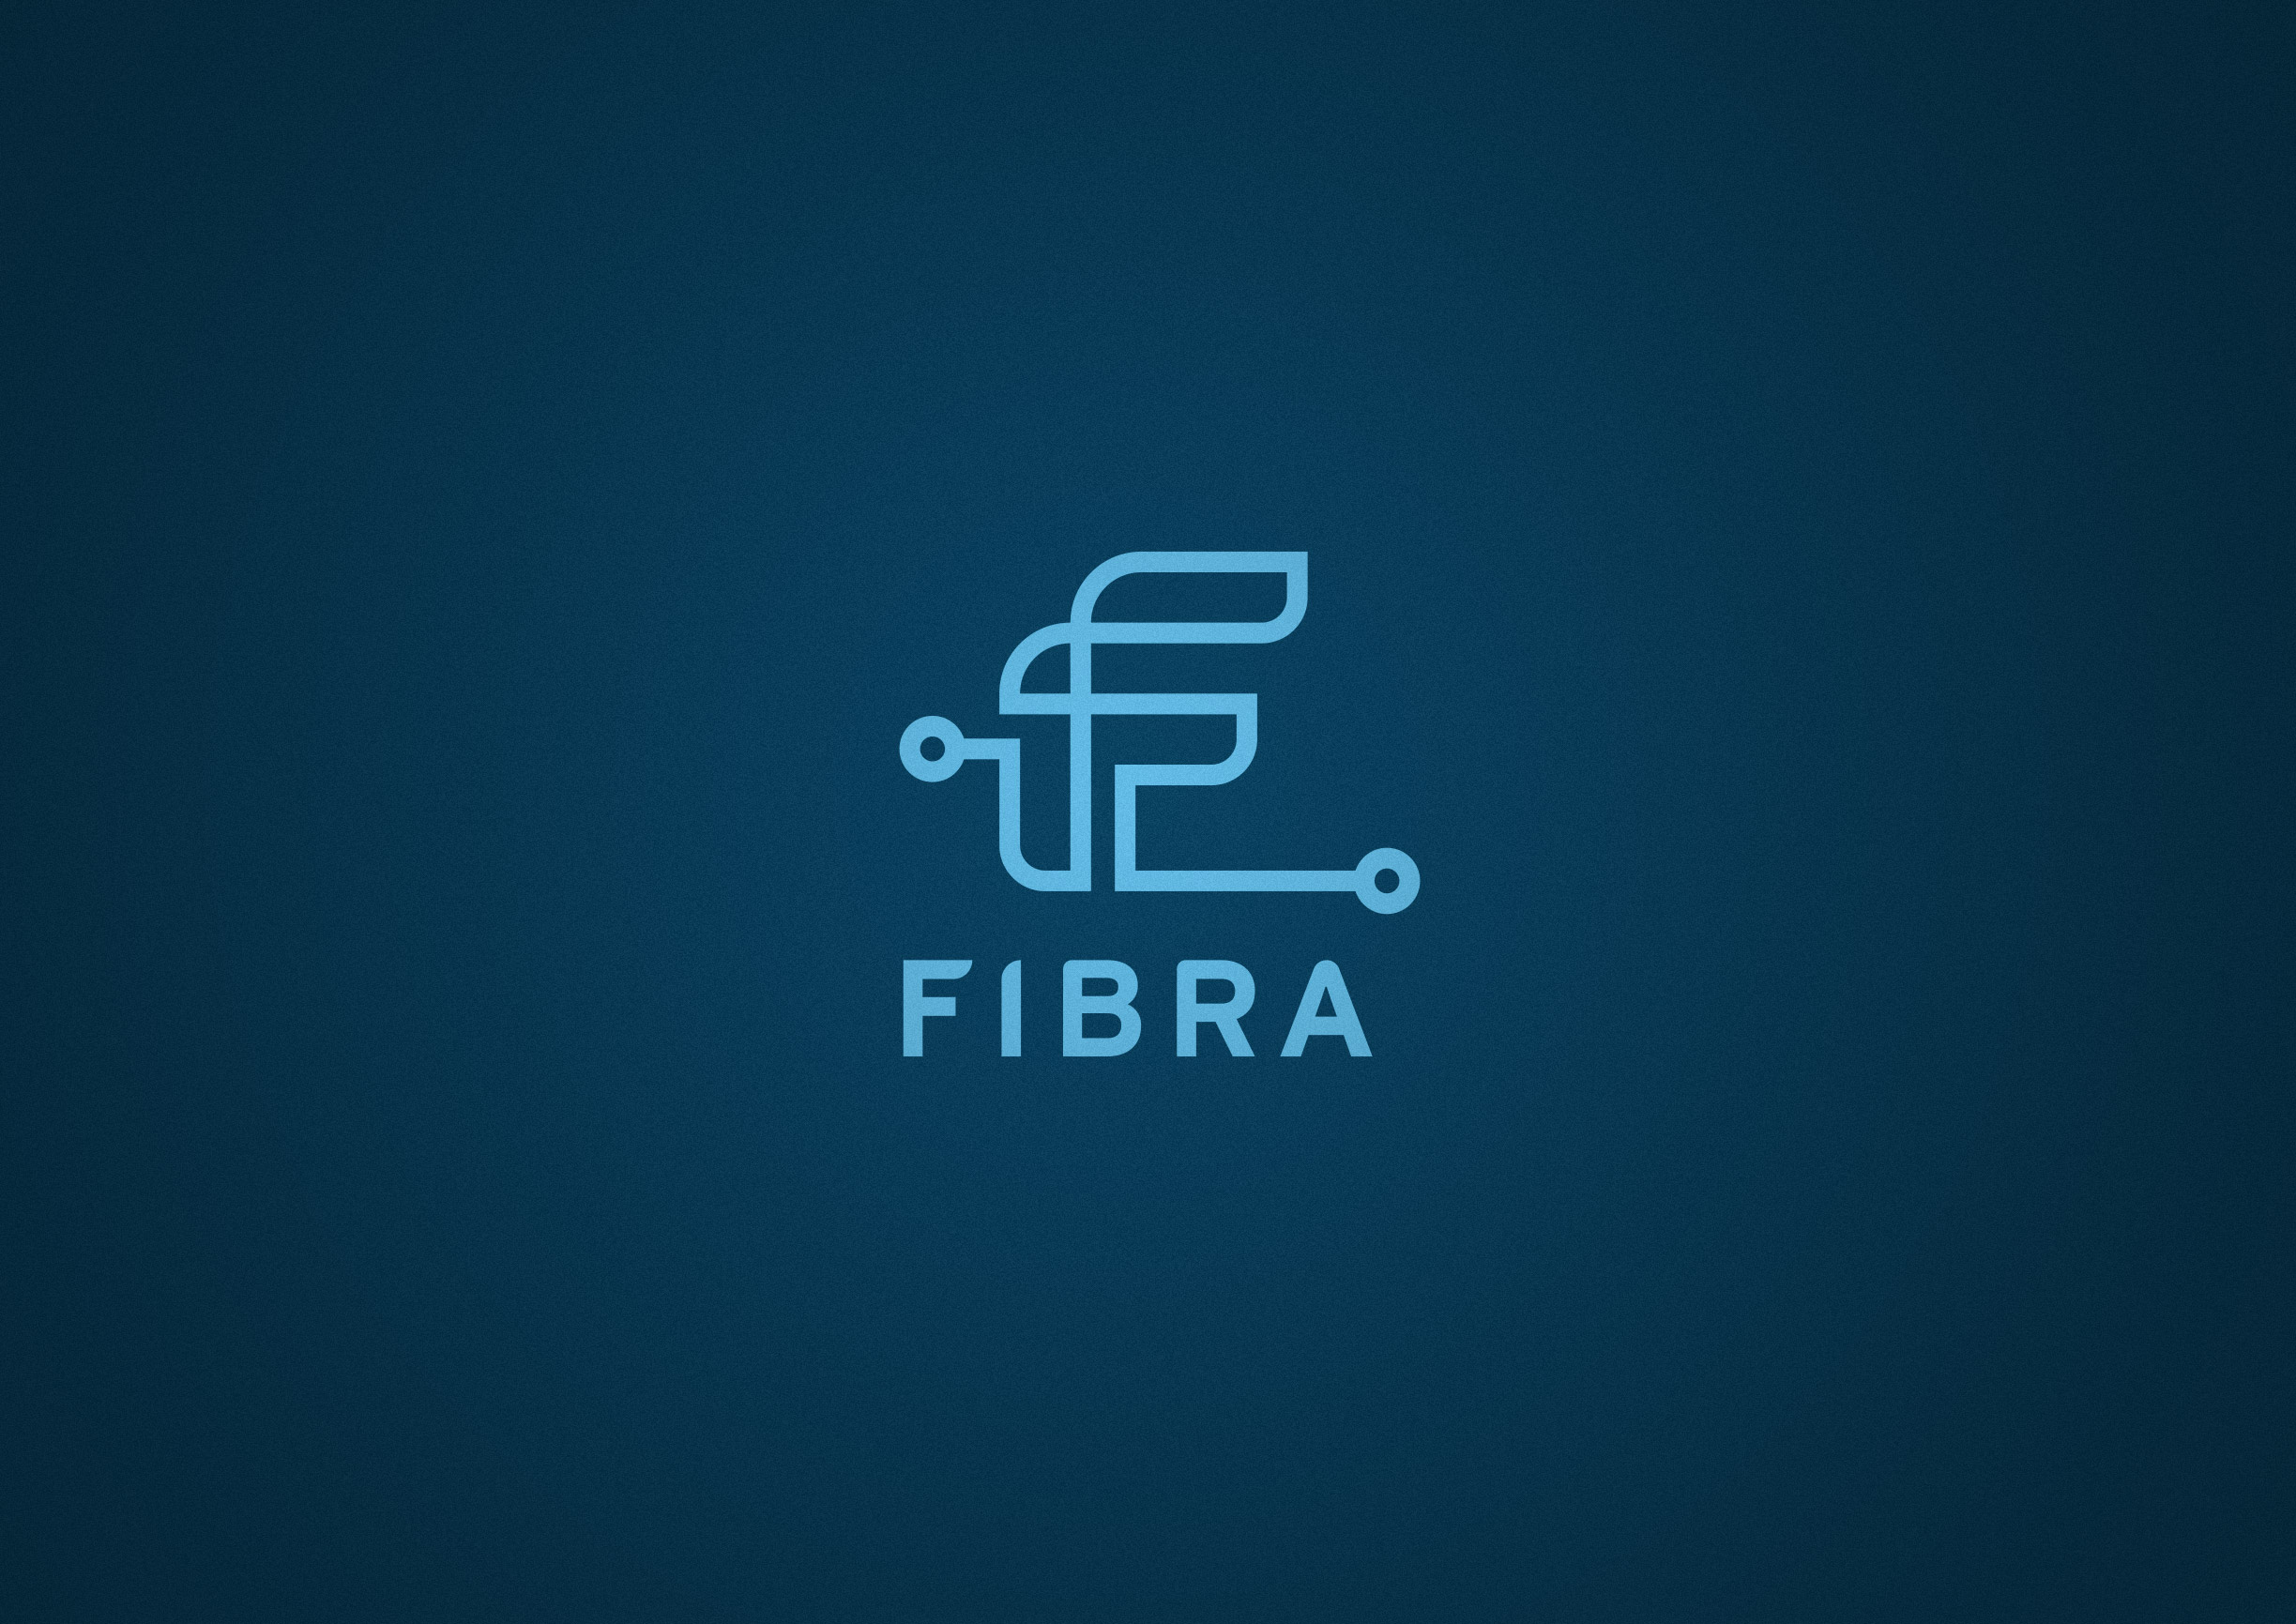 fibra_logo